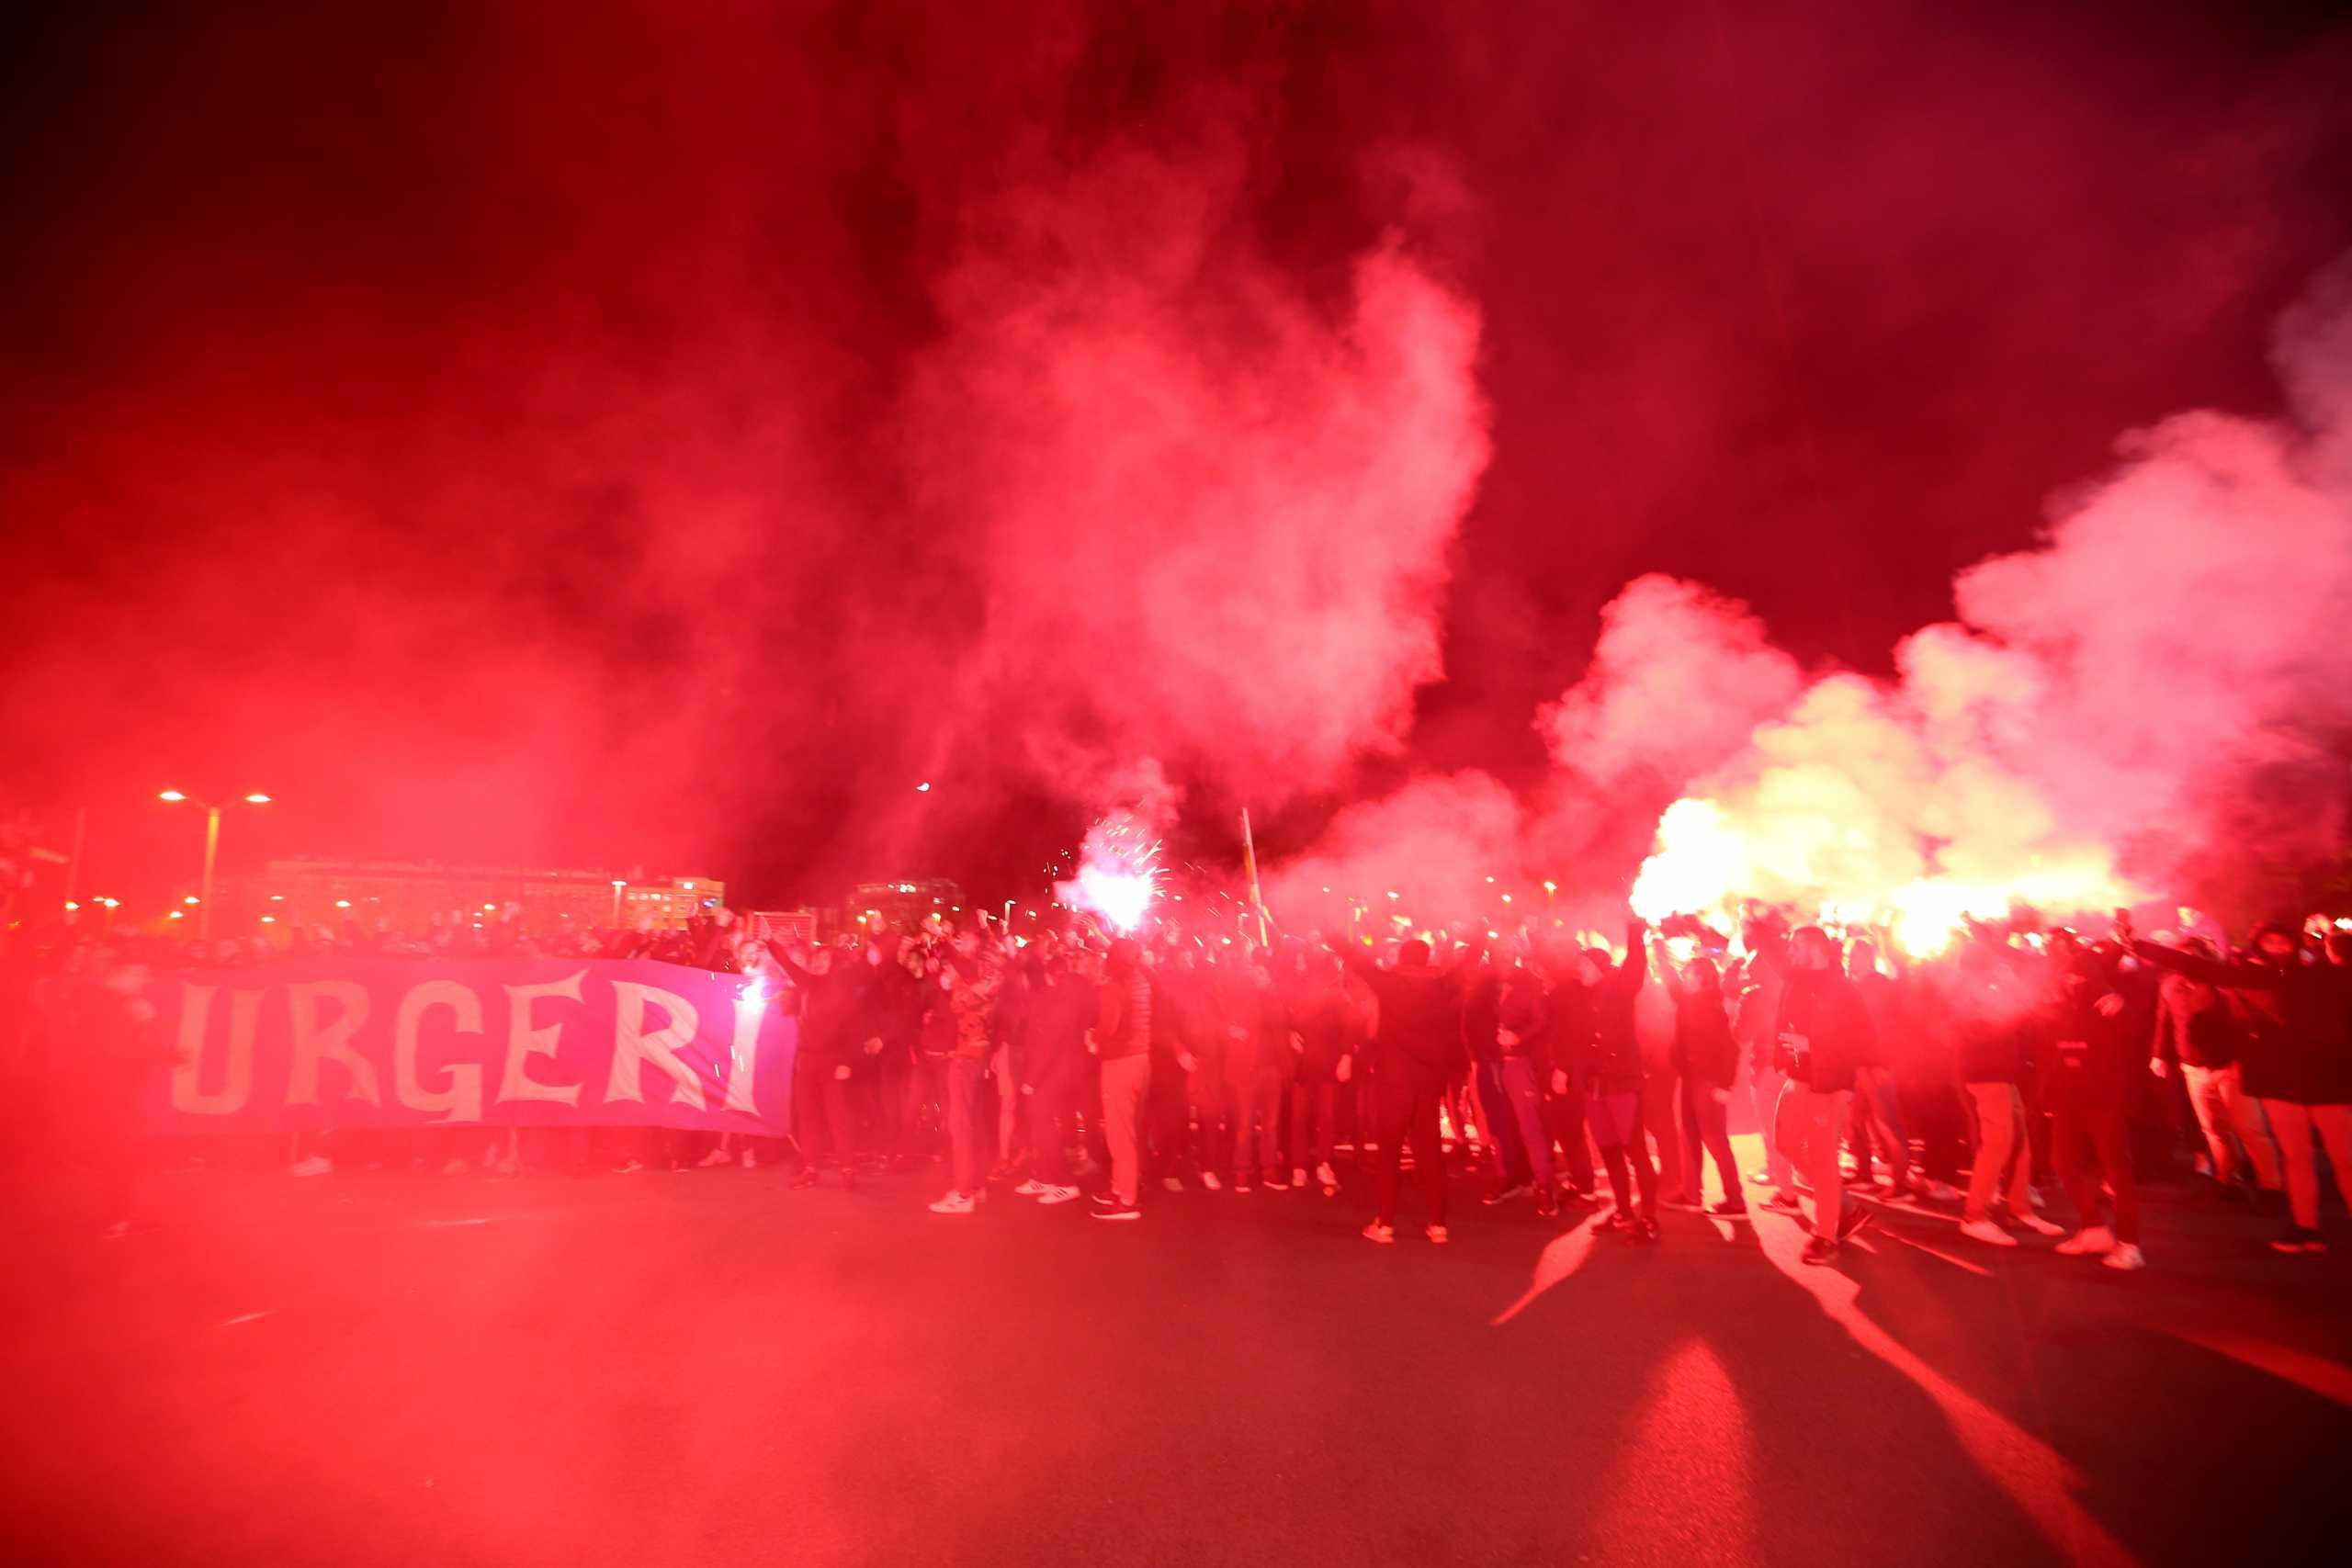 Europa League: «Κάηκε» το Ζάγκρεμπ για την ιστορική πρόκριση της Ντιναμό (pics)